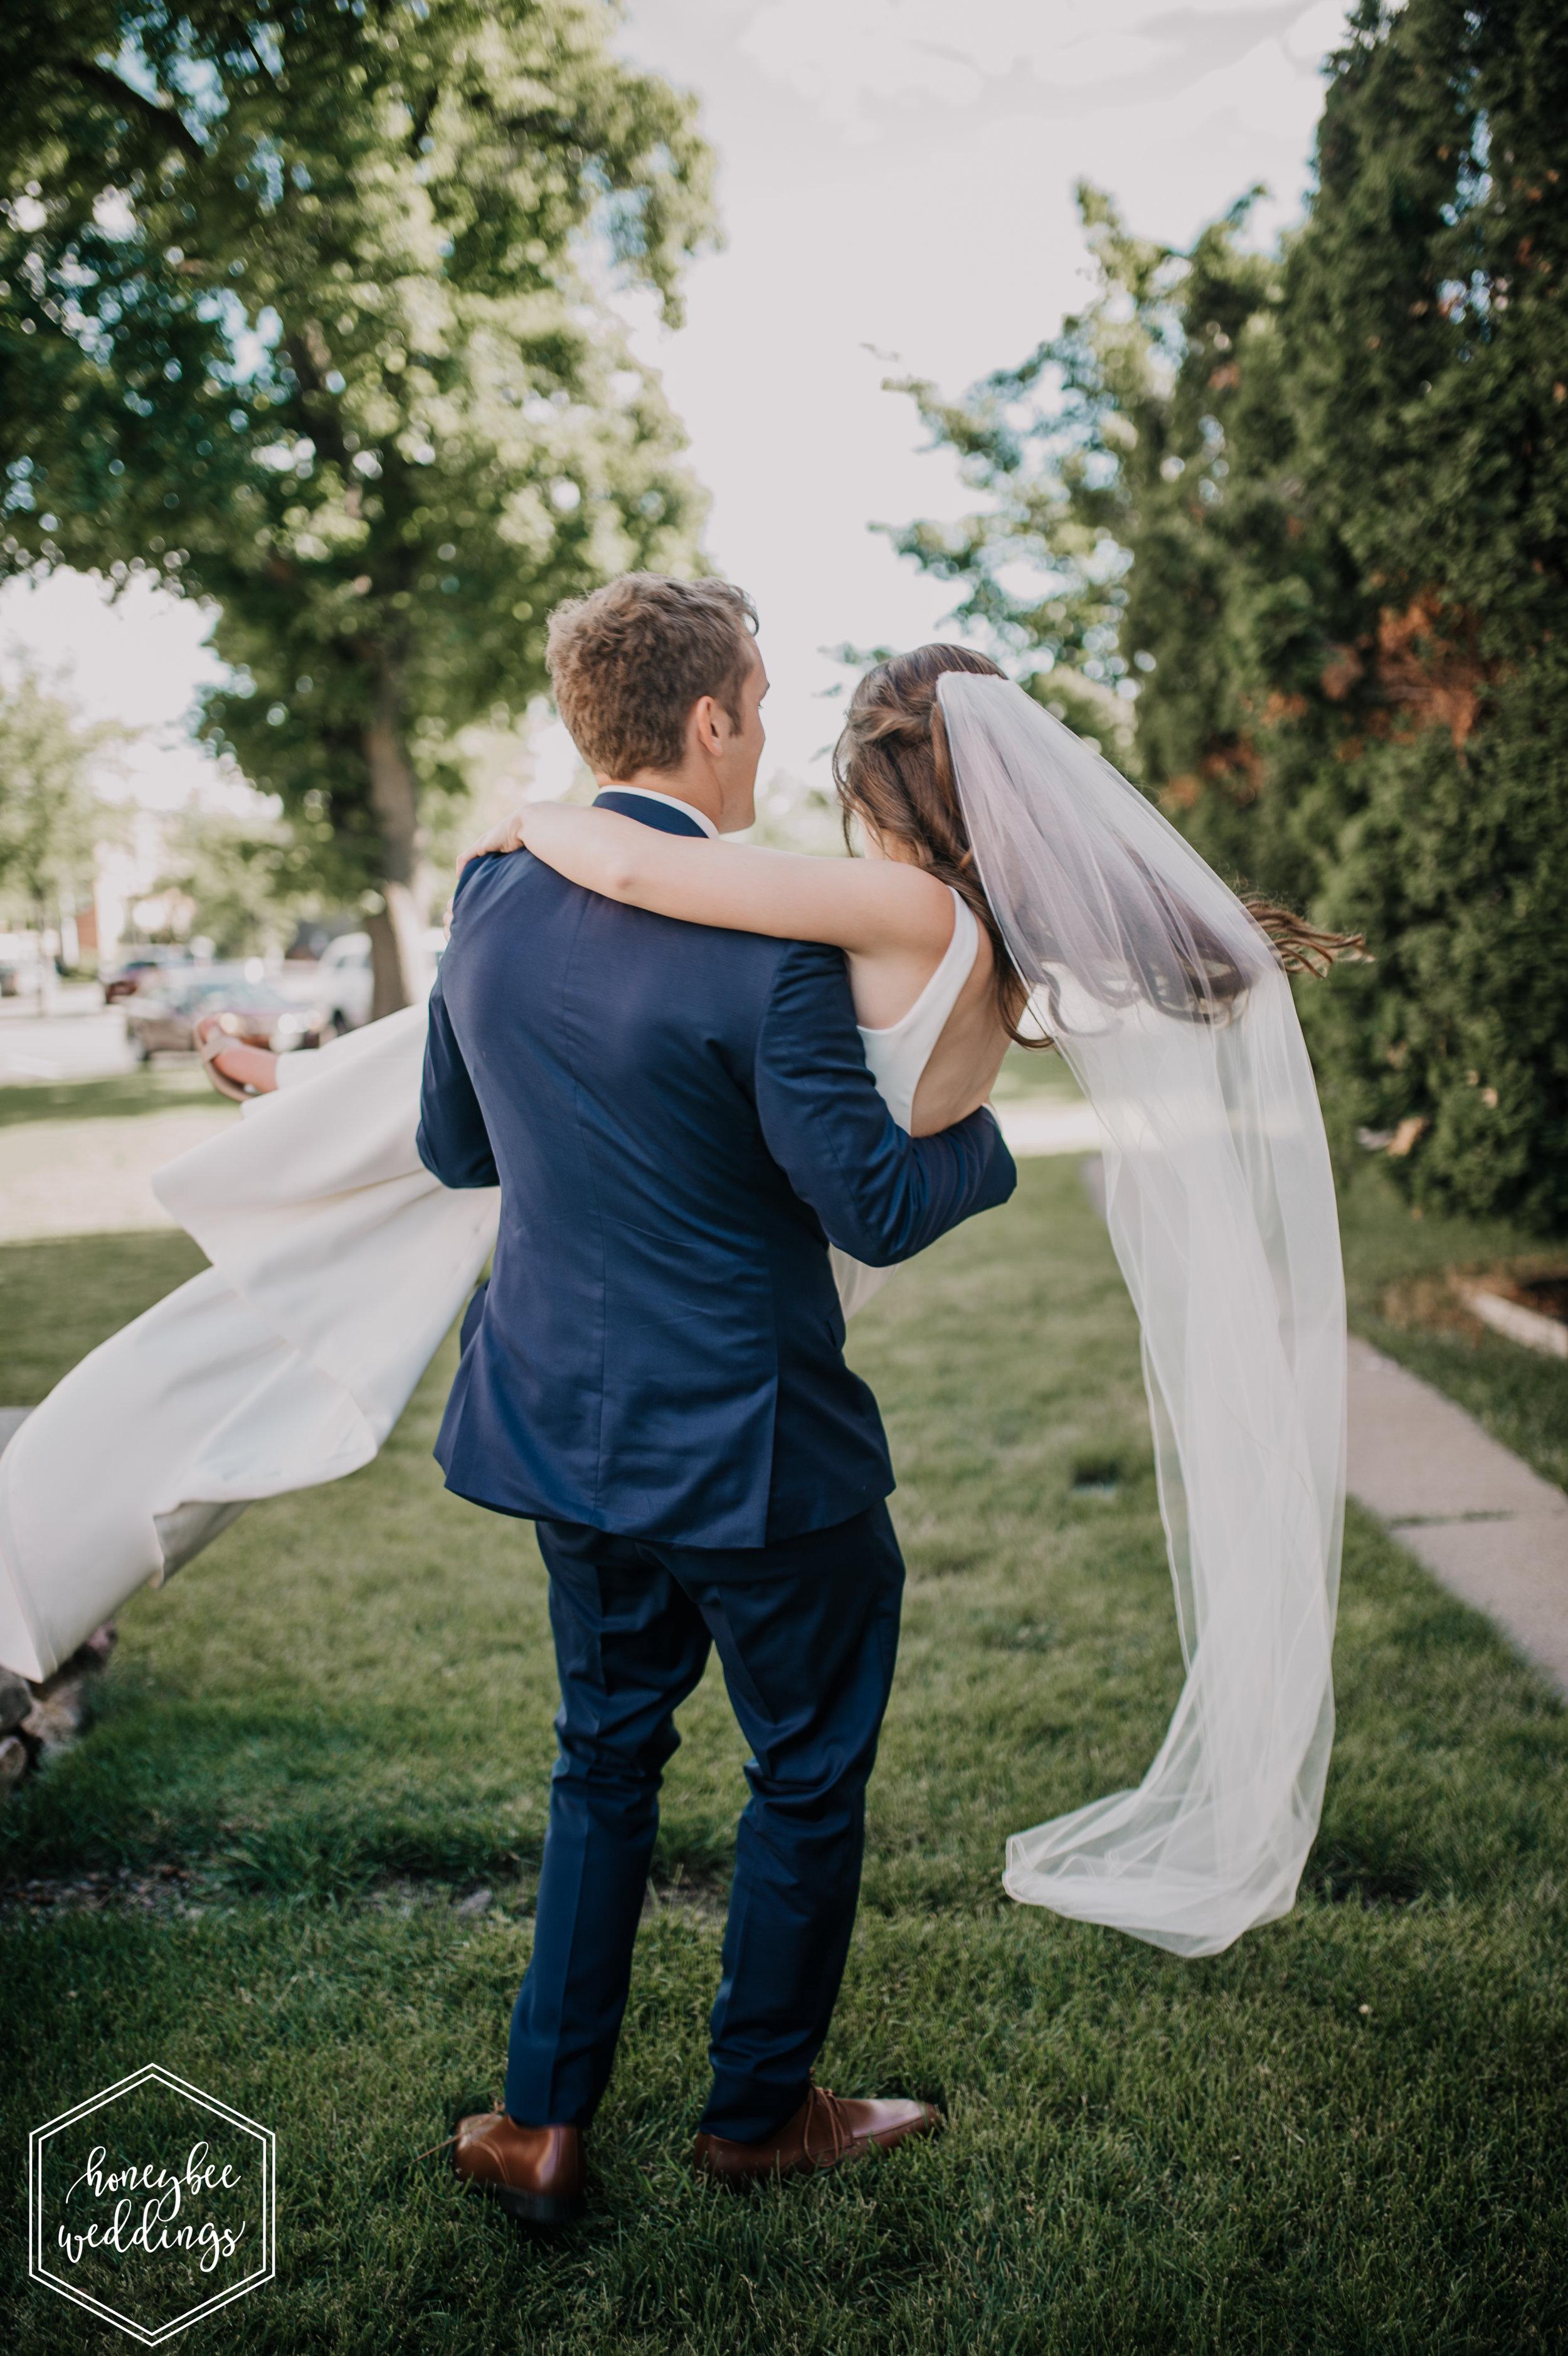 237 Montana Wedding Photographer_St. Francis Wedding_Tifani Zanto + Ryan Burke -6895.jpg